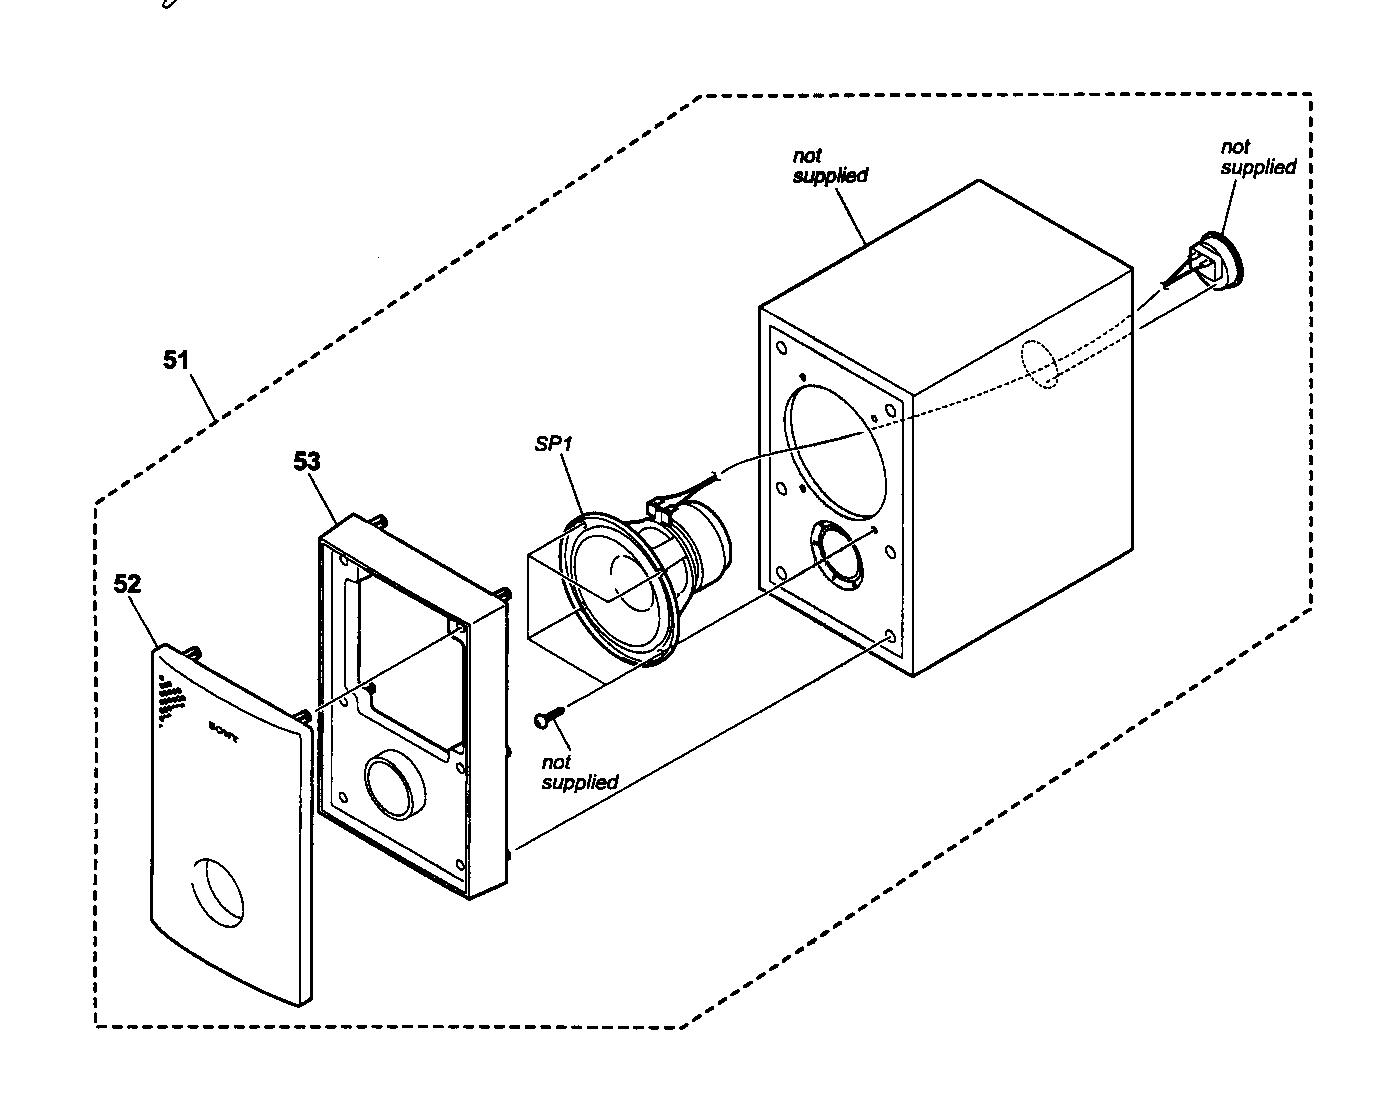 Colorful speaker diagram model best images for wiring diagram